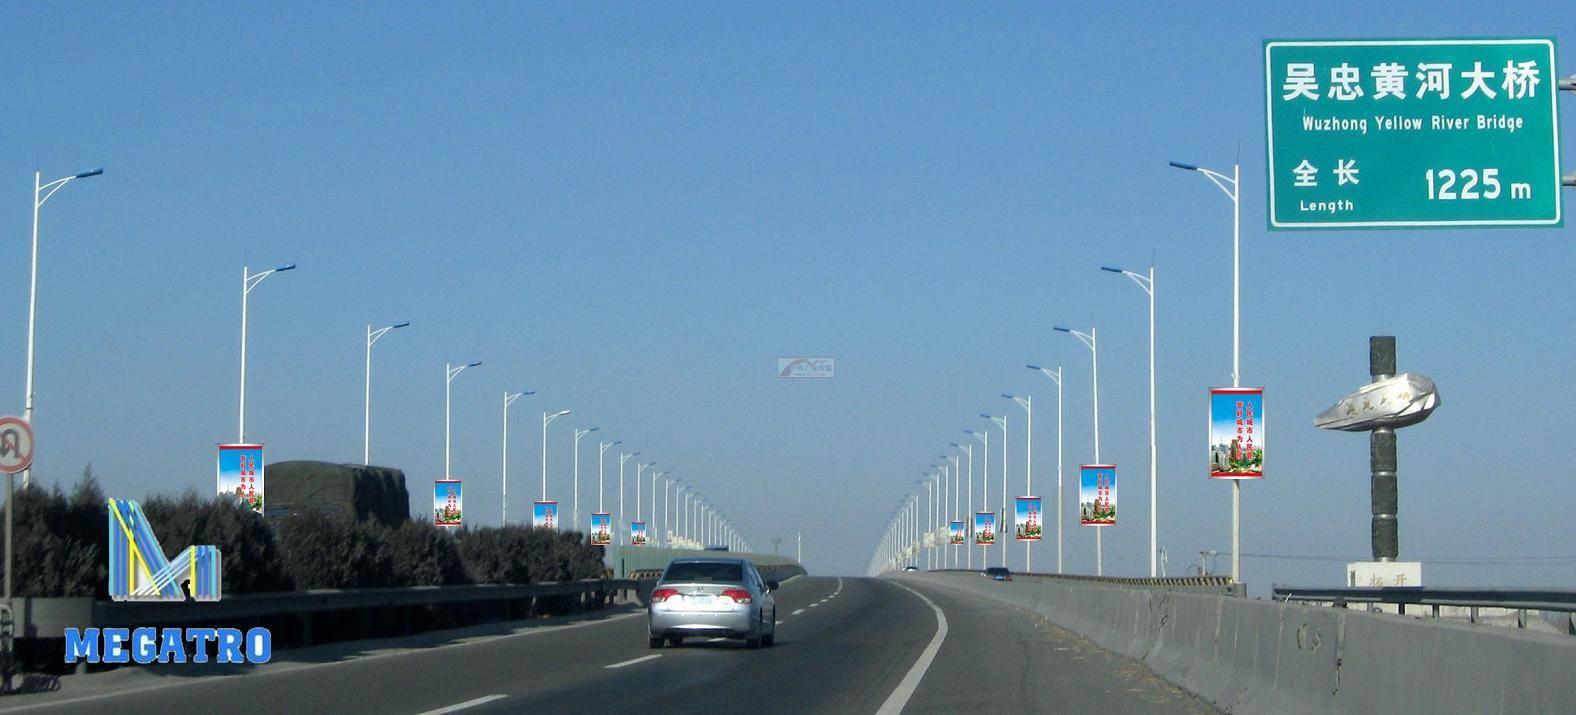 Highway Lighting pole (MGP-HLP01)